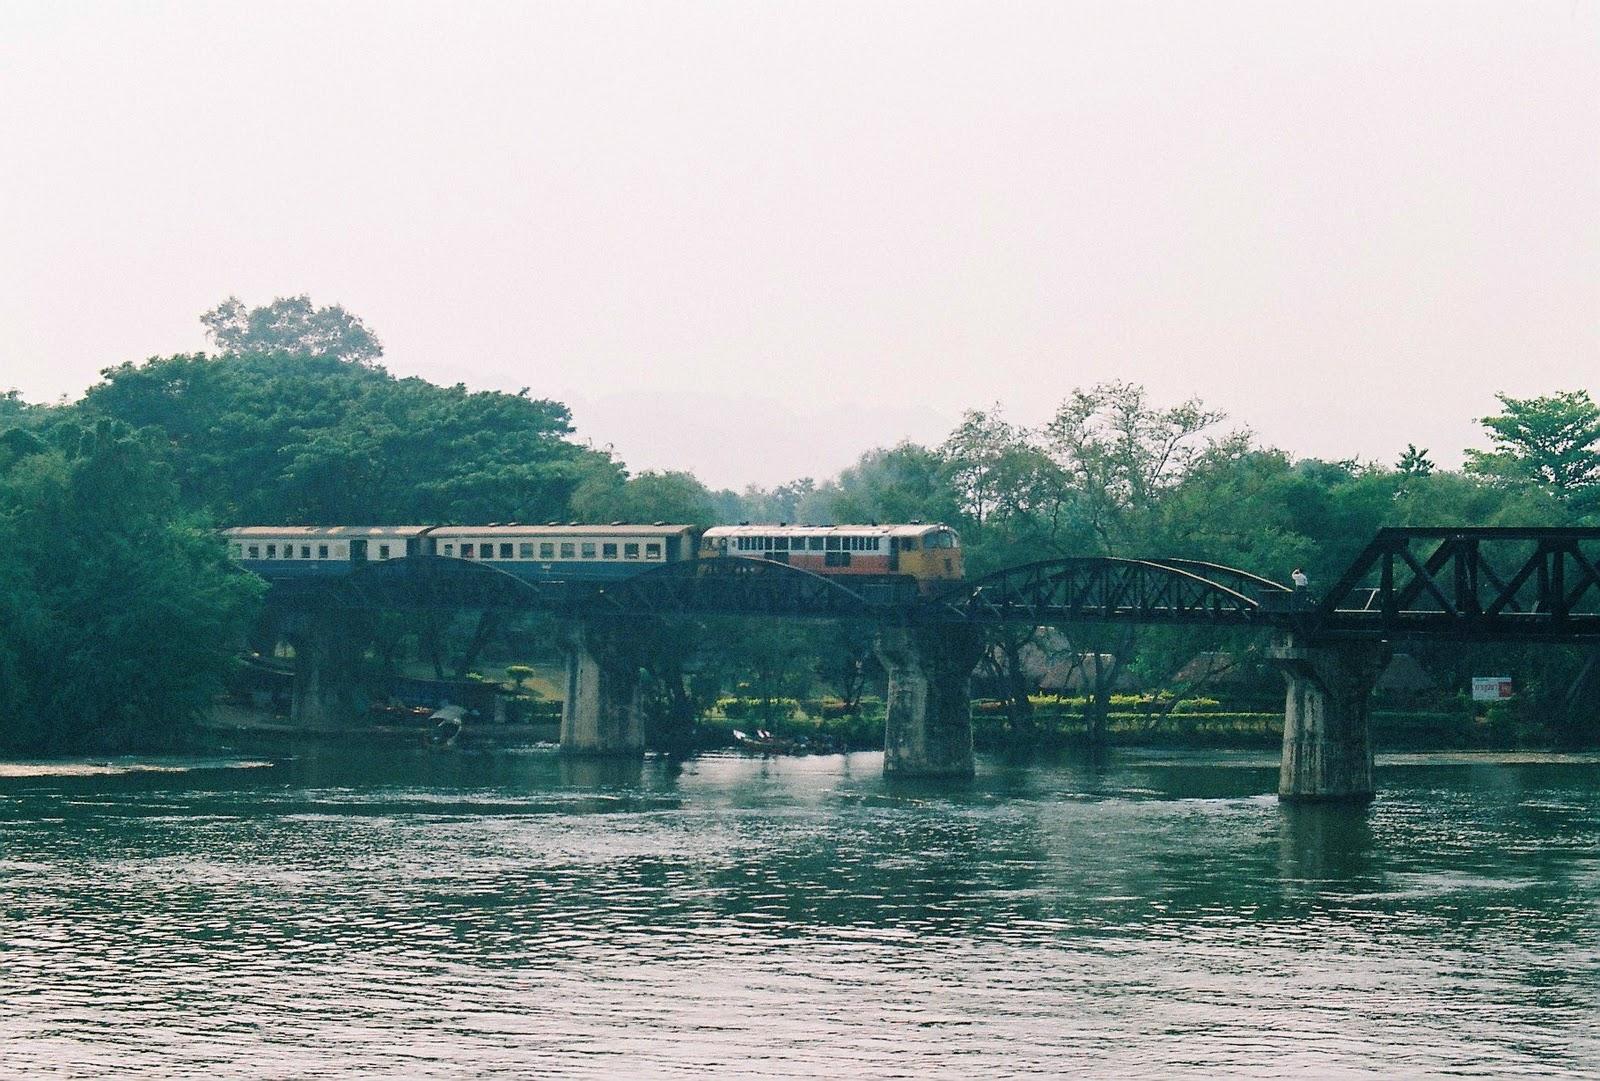 Beyond the bridge over the river Kwai in Kanchanaburi